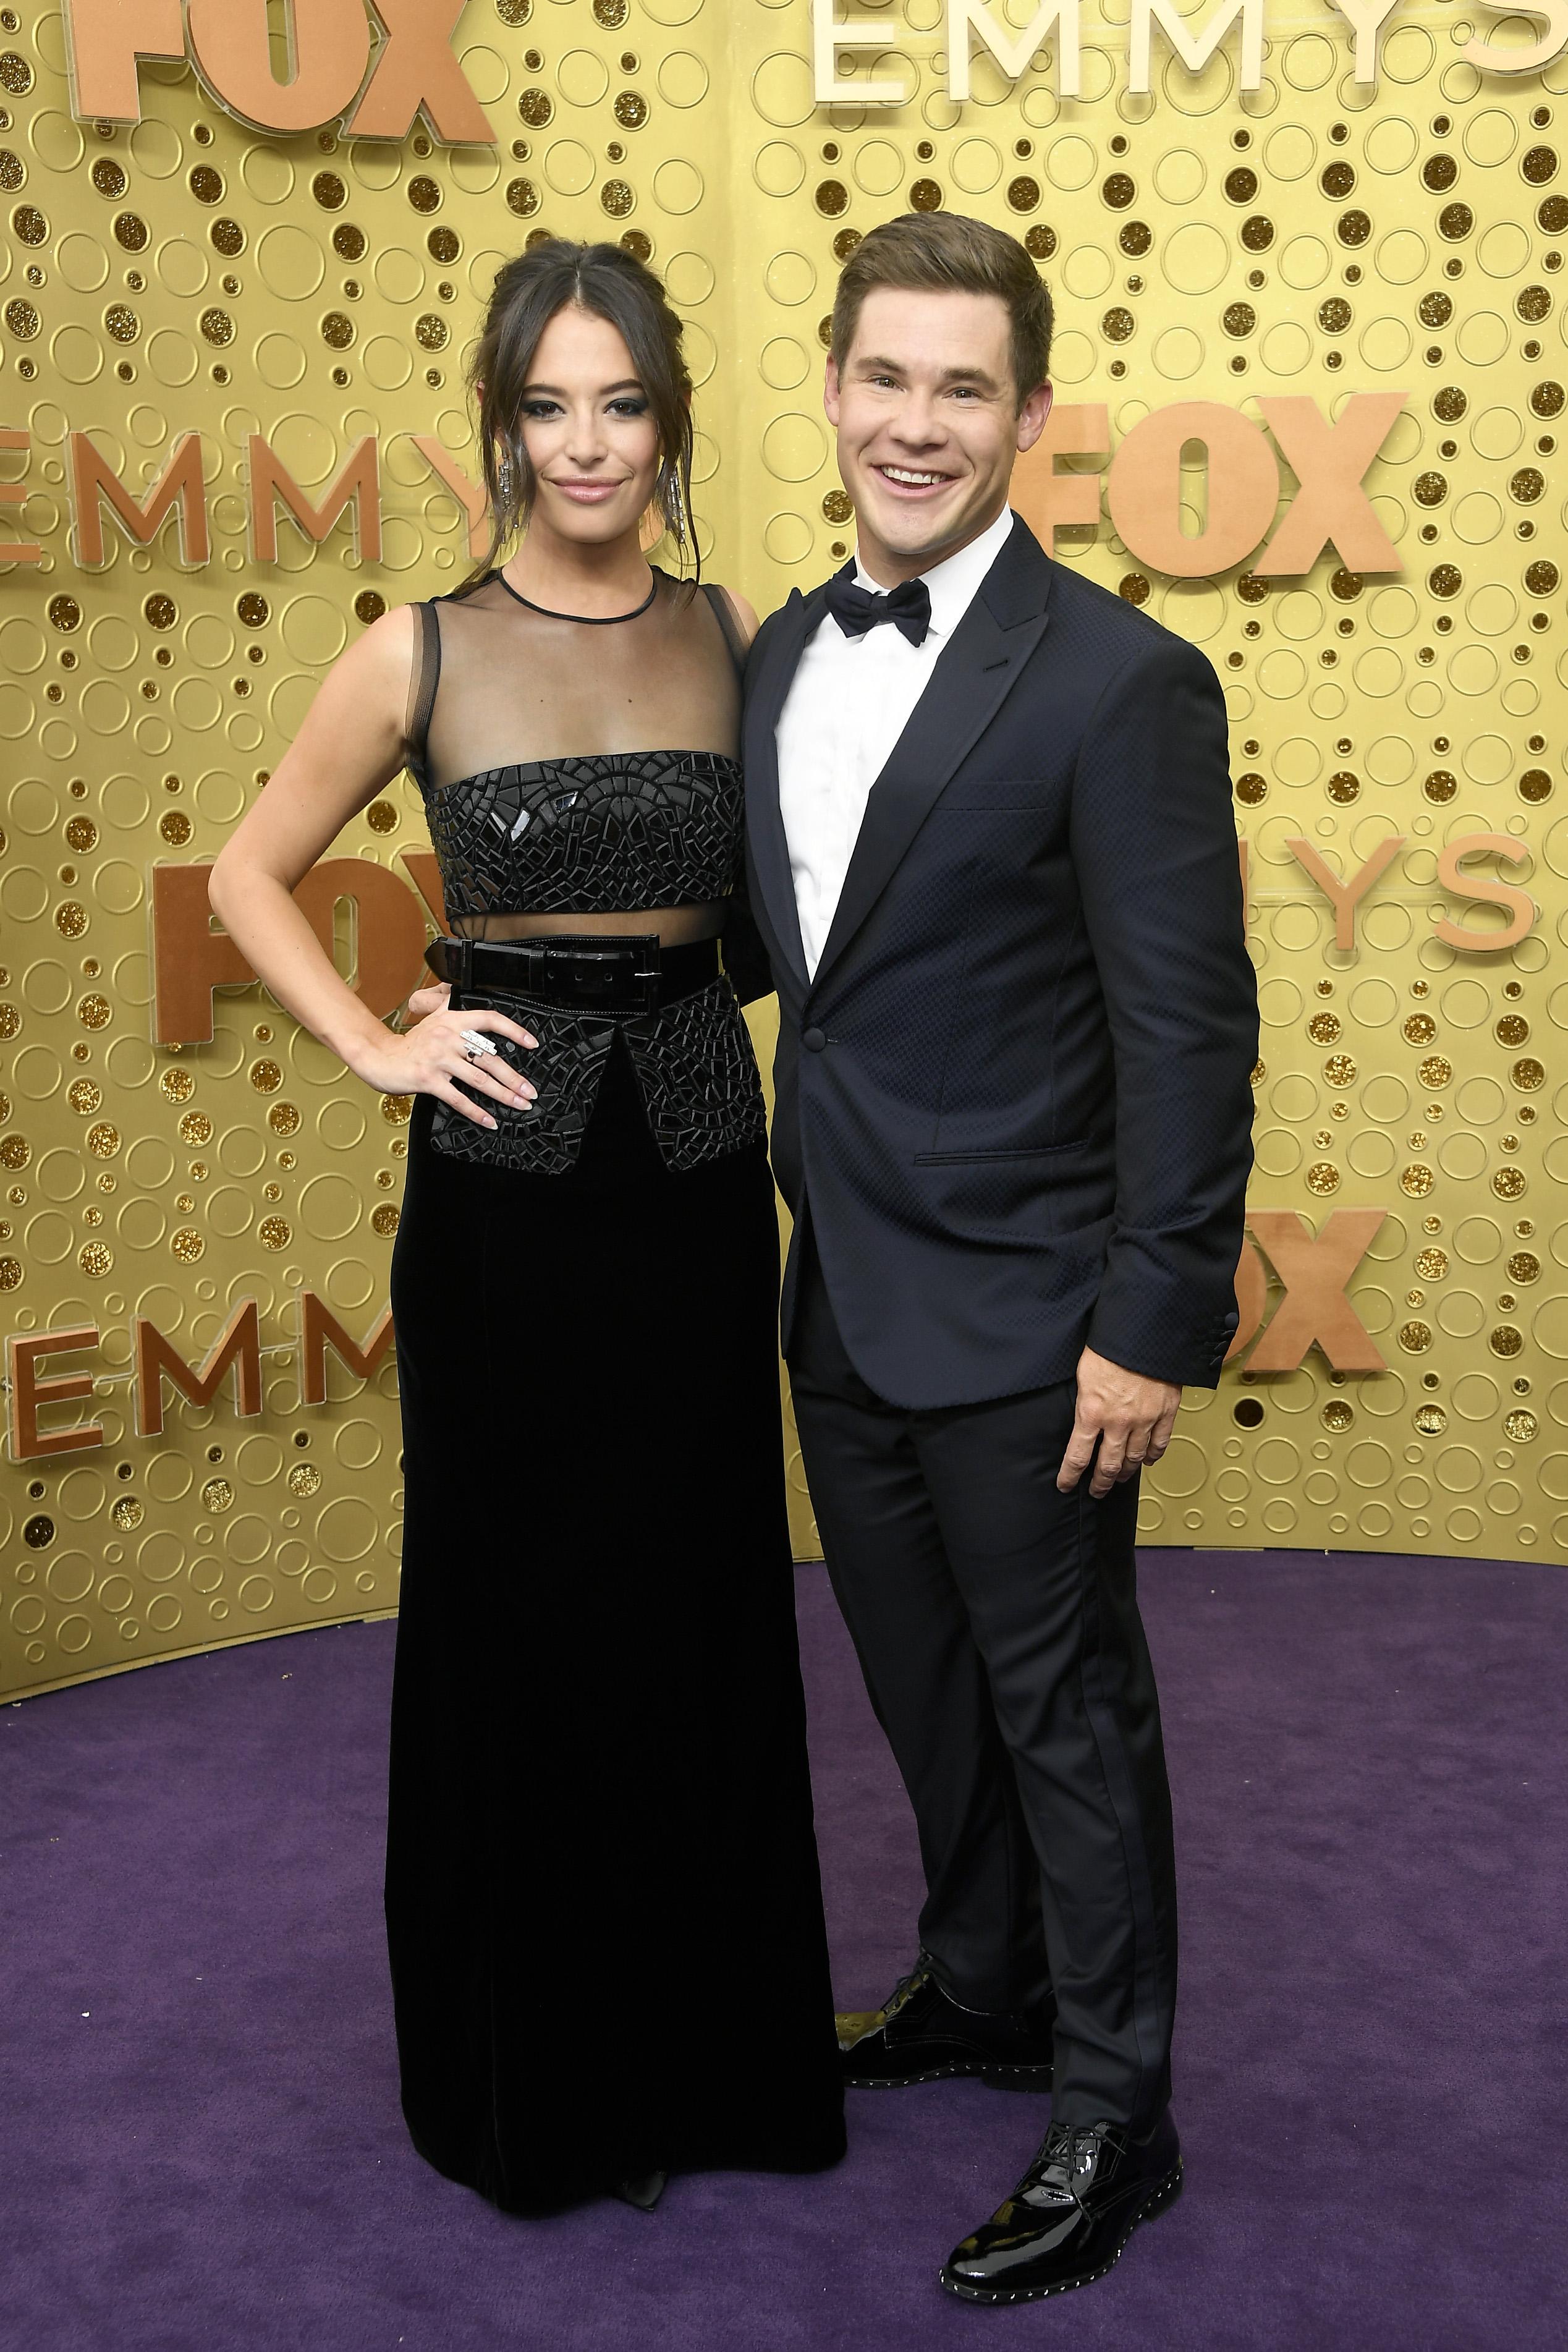 Adam Devine and Chloe Bridges at the Emmy awards.